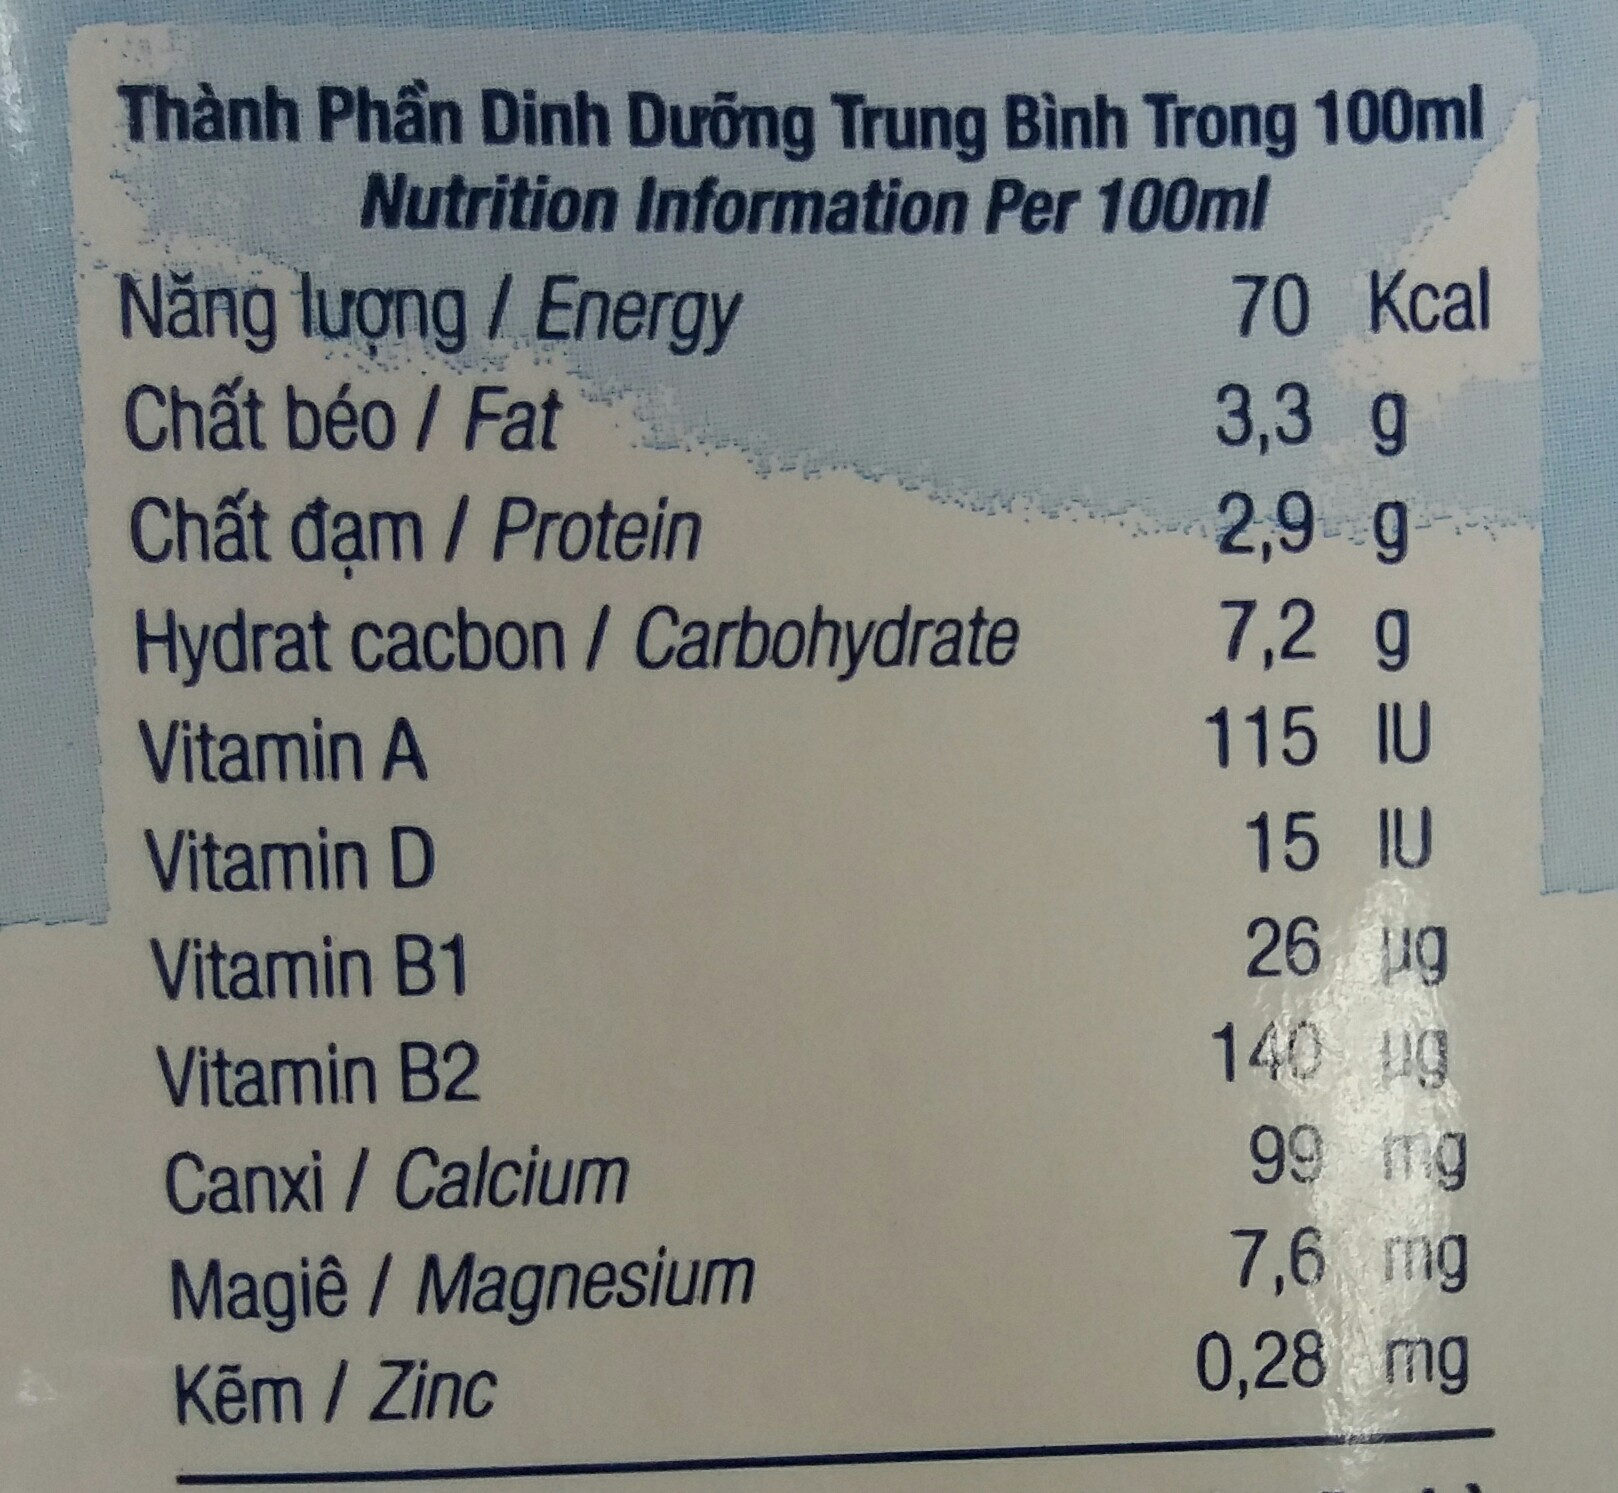 fresh milk less sugar - Giá trị dinh dưỡng - vi